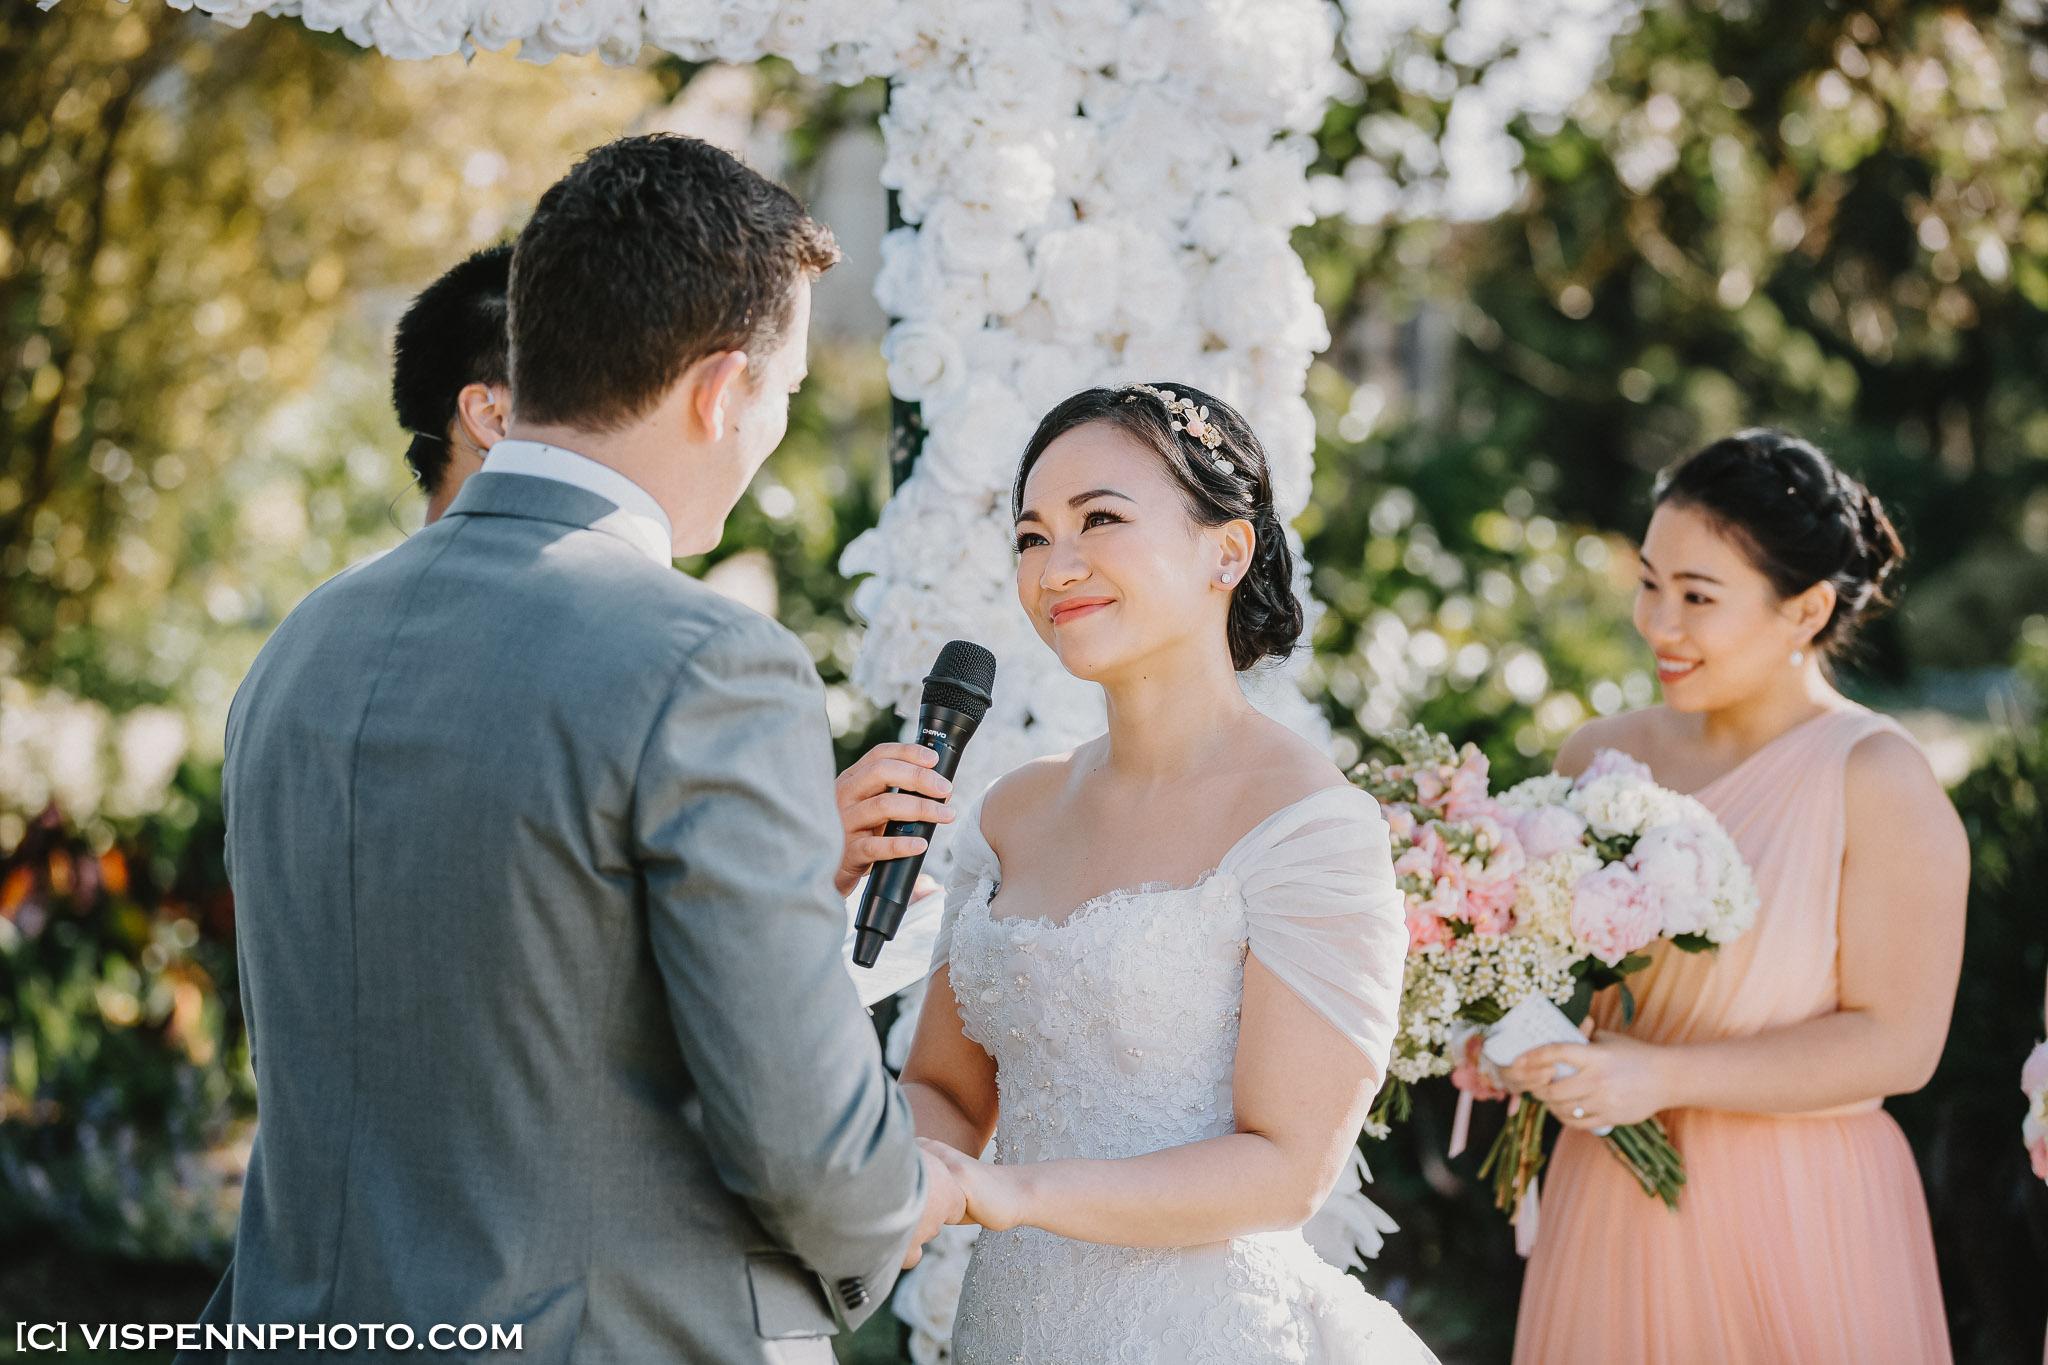 WEDDING DAY Photography Melbourne VISPENN 墨尔本 婚礼跟拍 婚礼摄像 婚礼摄影 结婚照 登记照 VISPENN Kat H1 01717